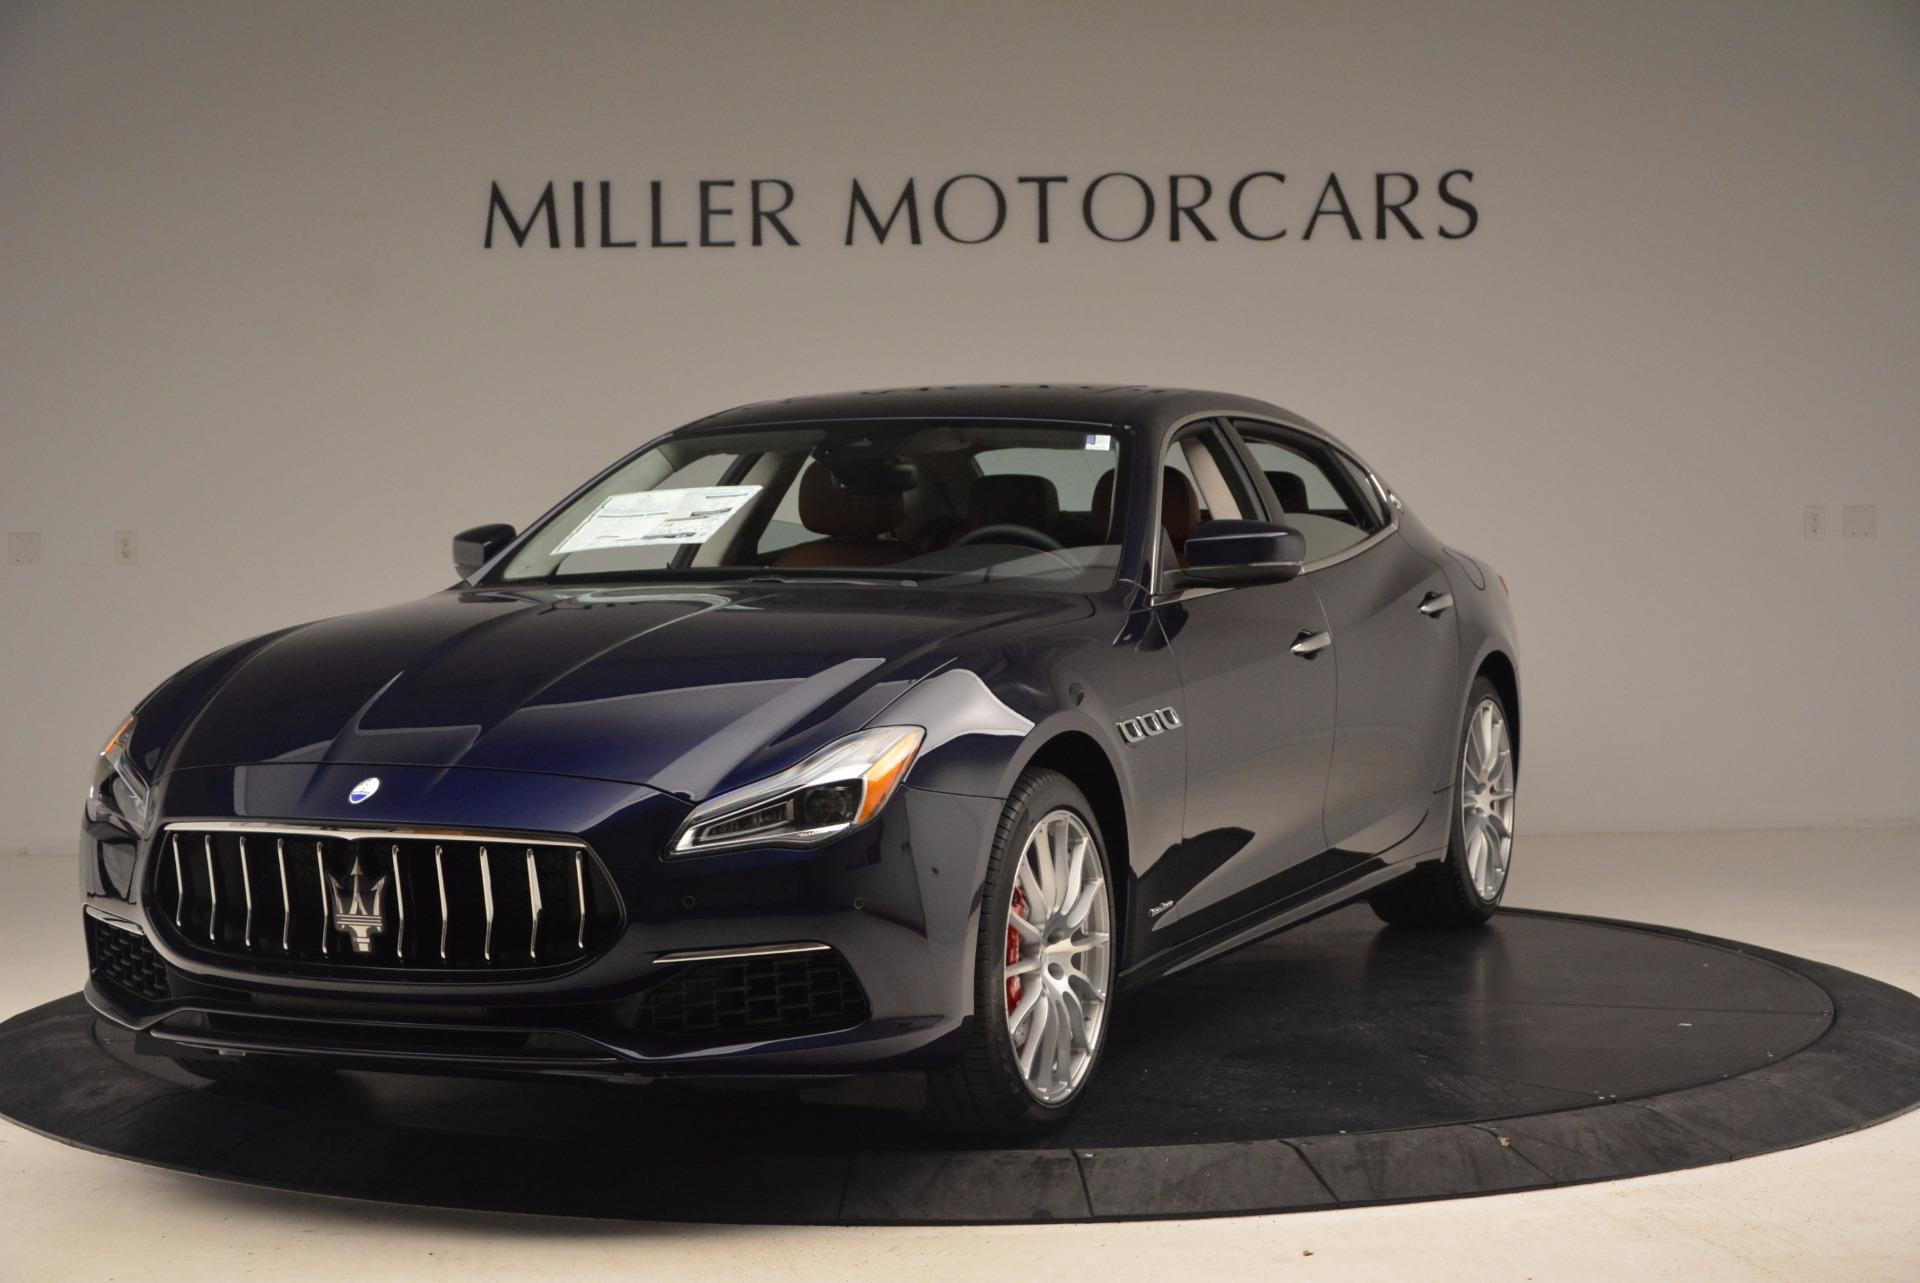 New 2018 Maserati Quattroporte S Q4 GranLusso For Sale In Westport, CT 1614_main